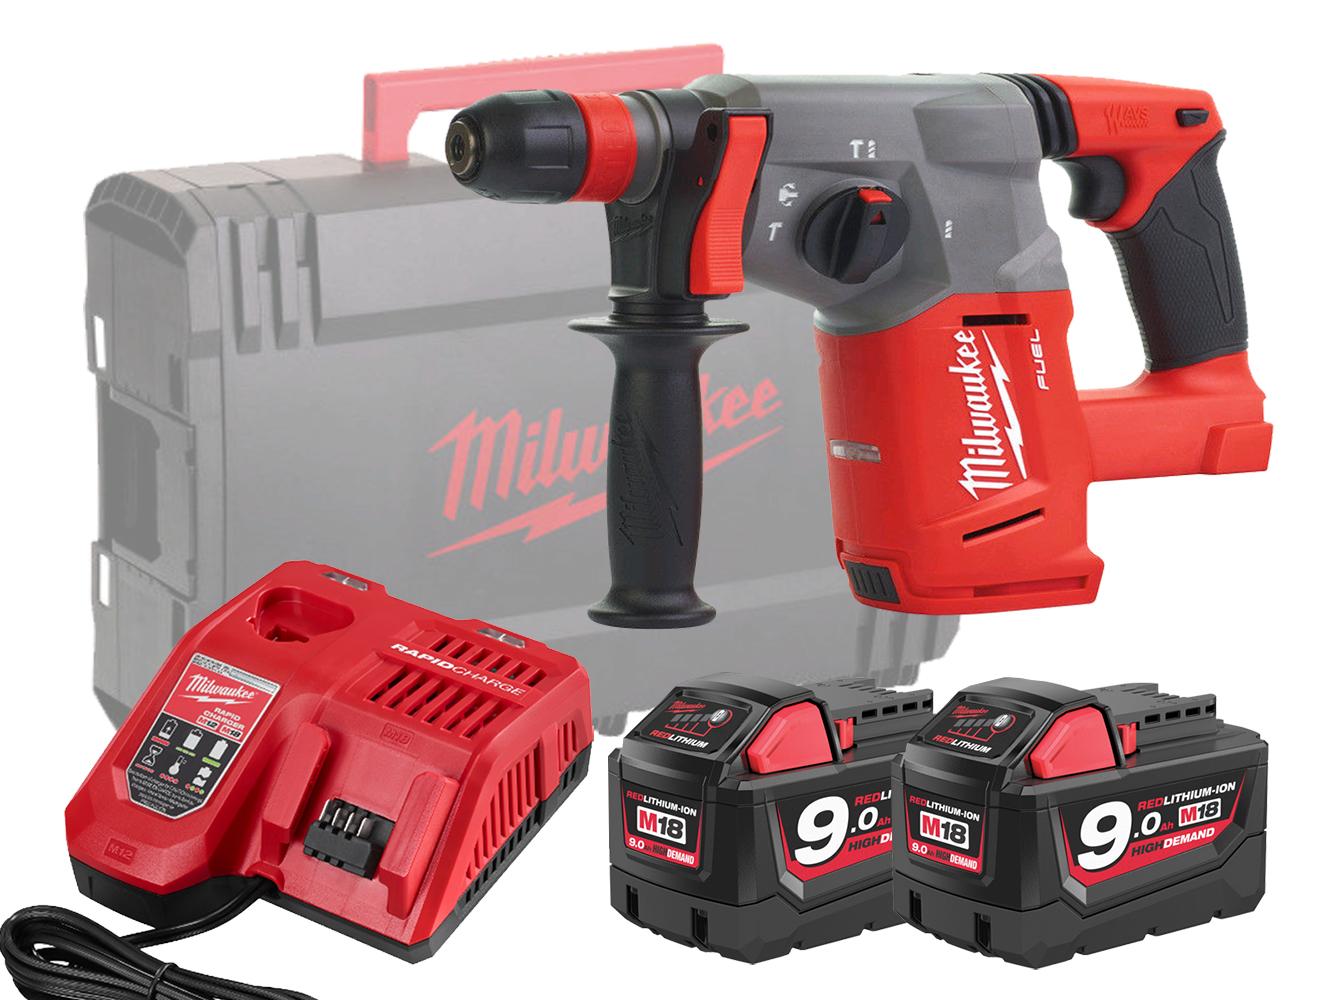 Milwaukee M18CHX 18V Fuel Brushless SDS+ 3-Mode Hammer Drill - 9.0Ah Pack